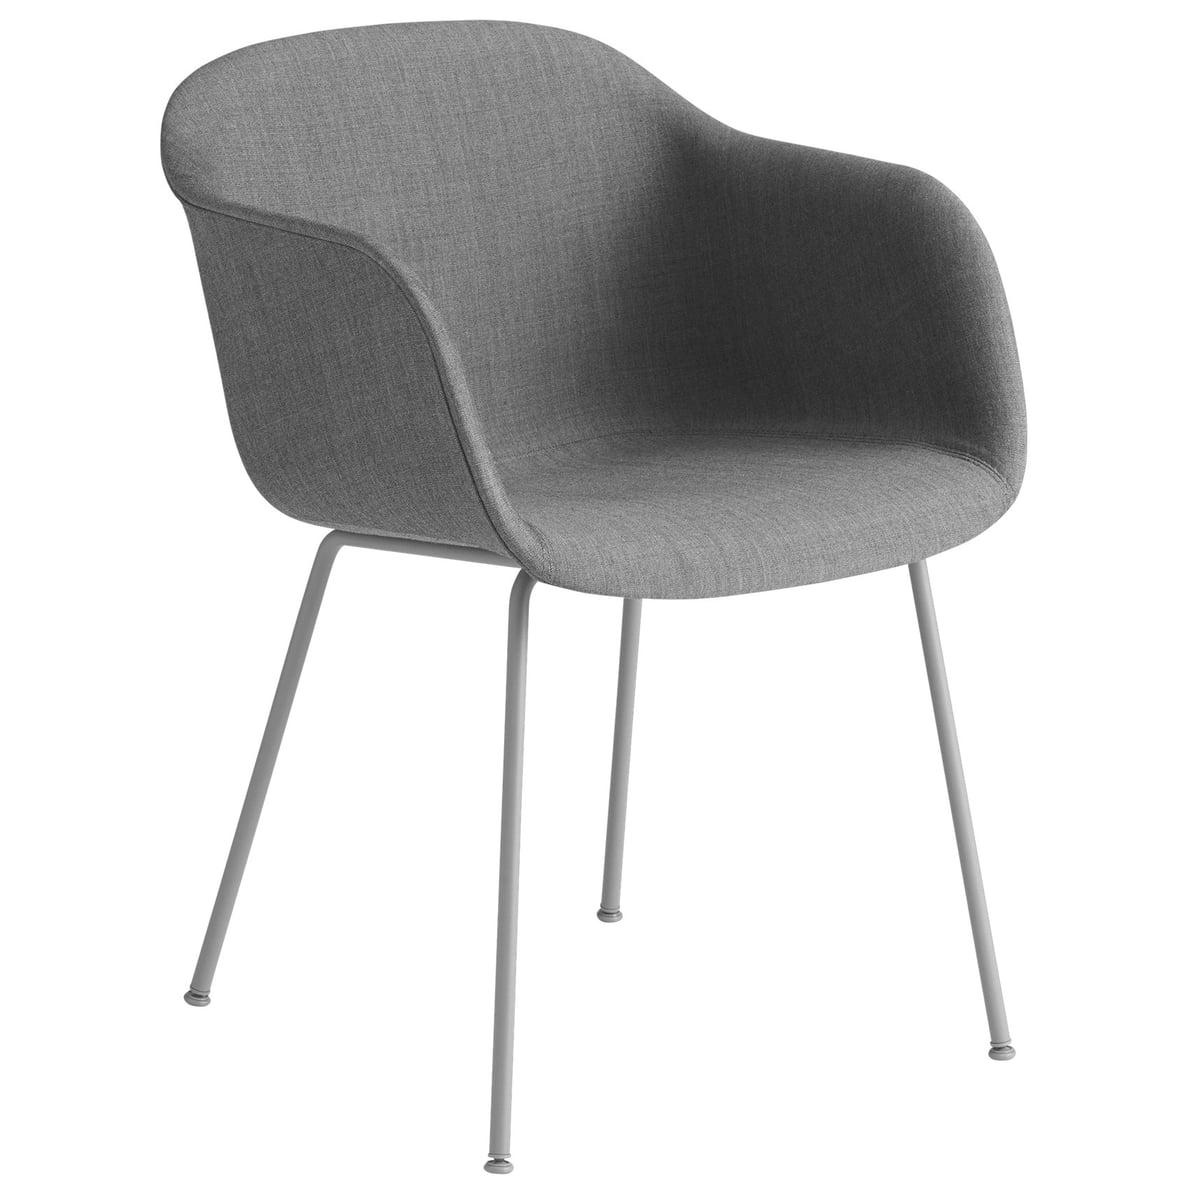 Muuto Fiber Chair Tube Base, grau Remix 133